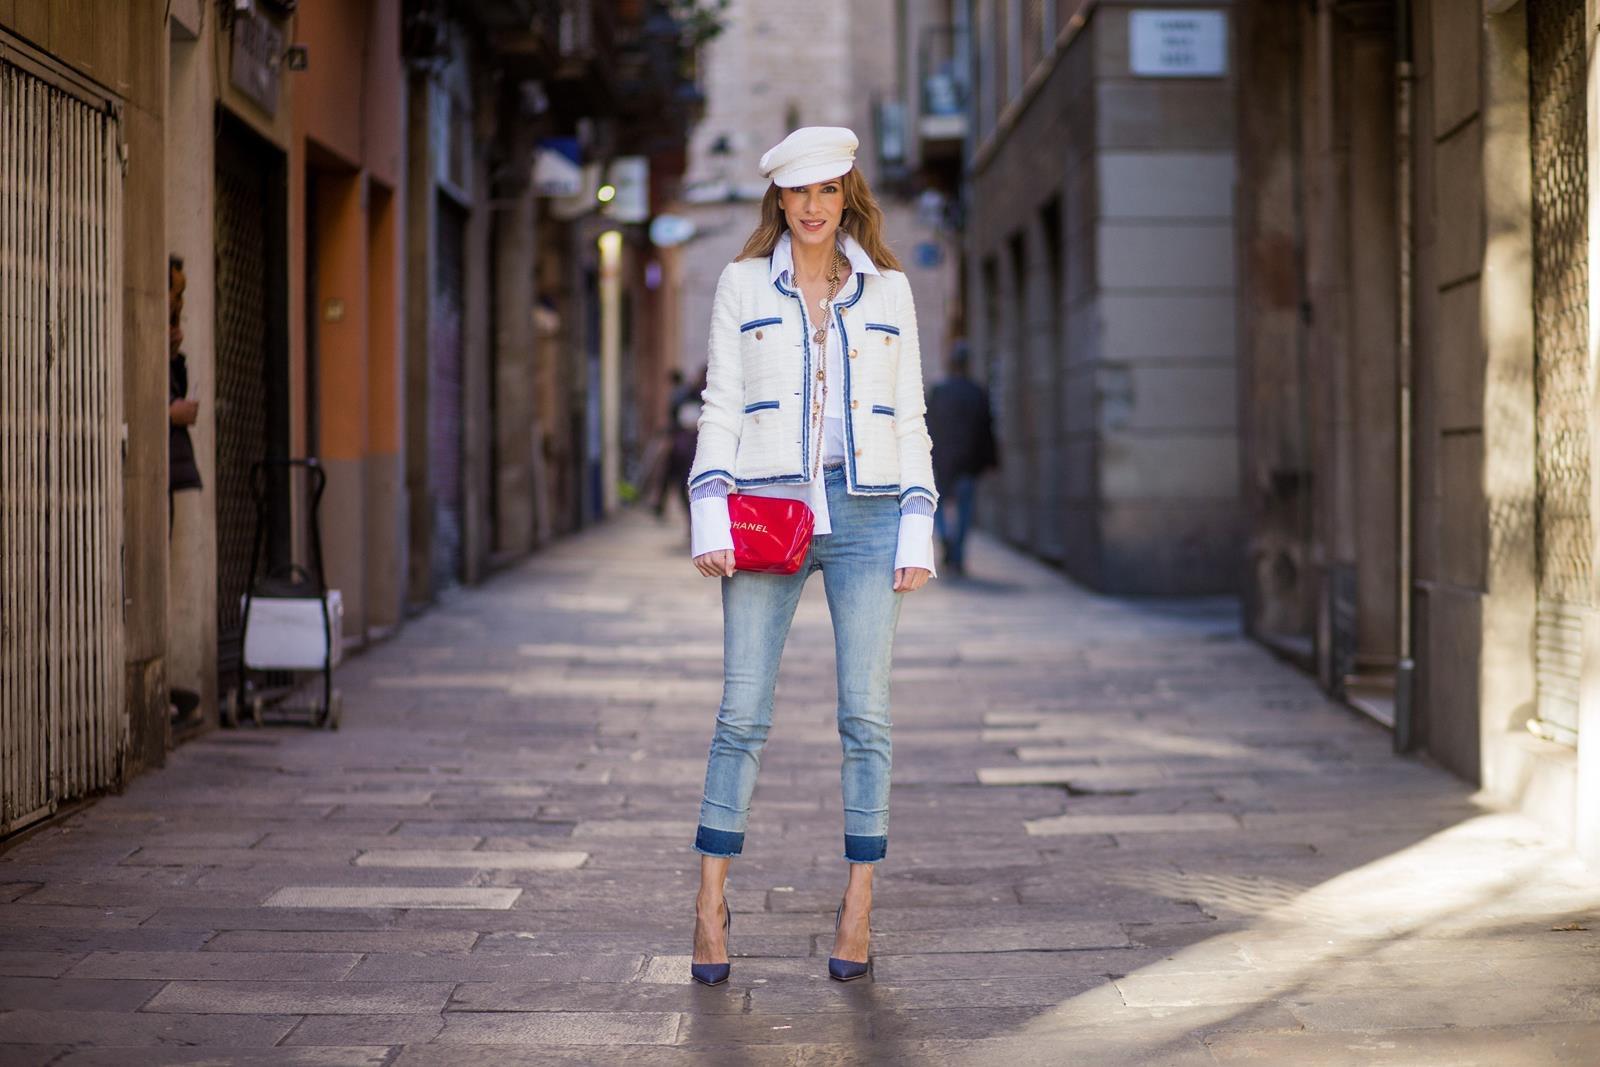 706b78e00754 ... SPAIN - NOVEMBER 28: Alexandra Lapp wearing a classic navy and white  tweed · «